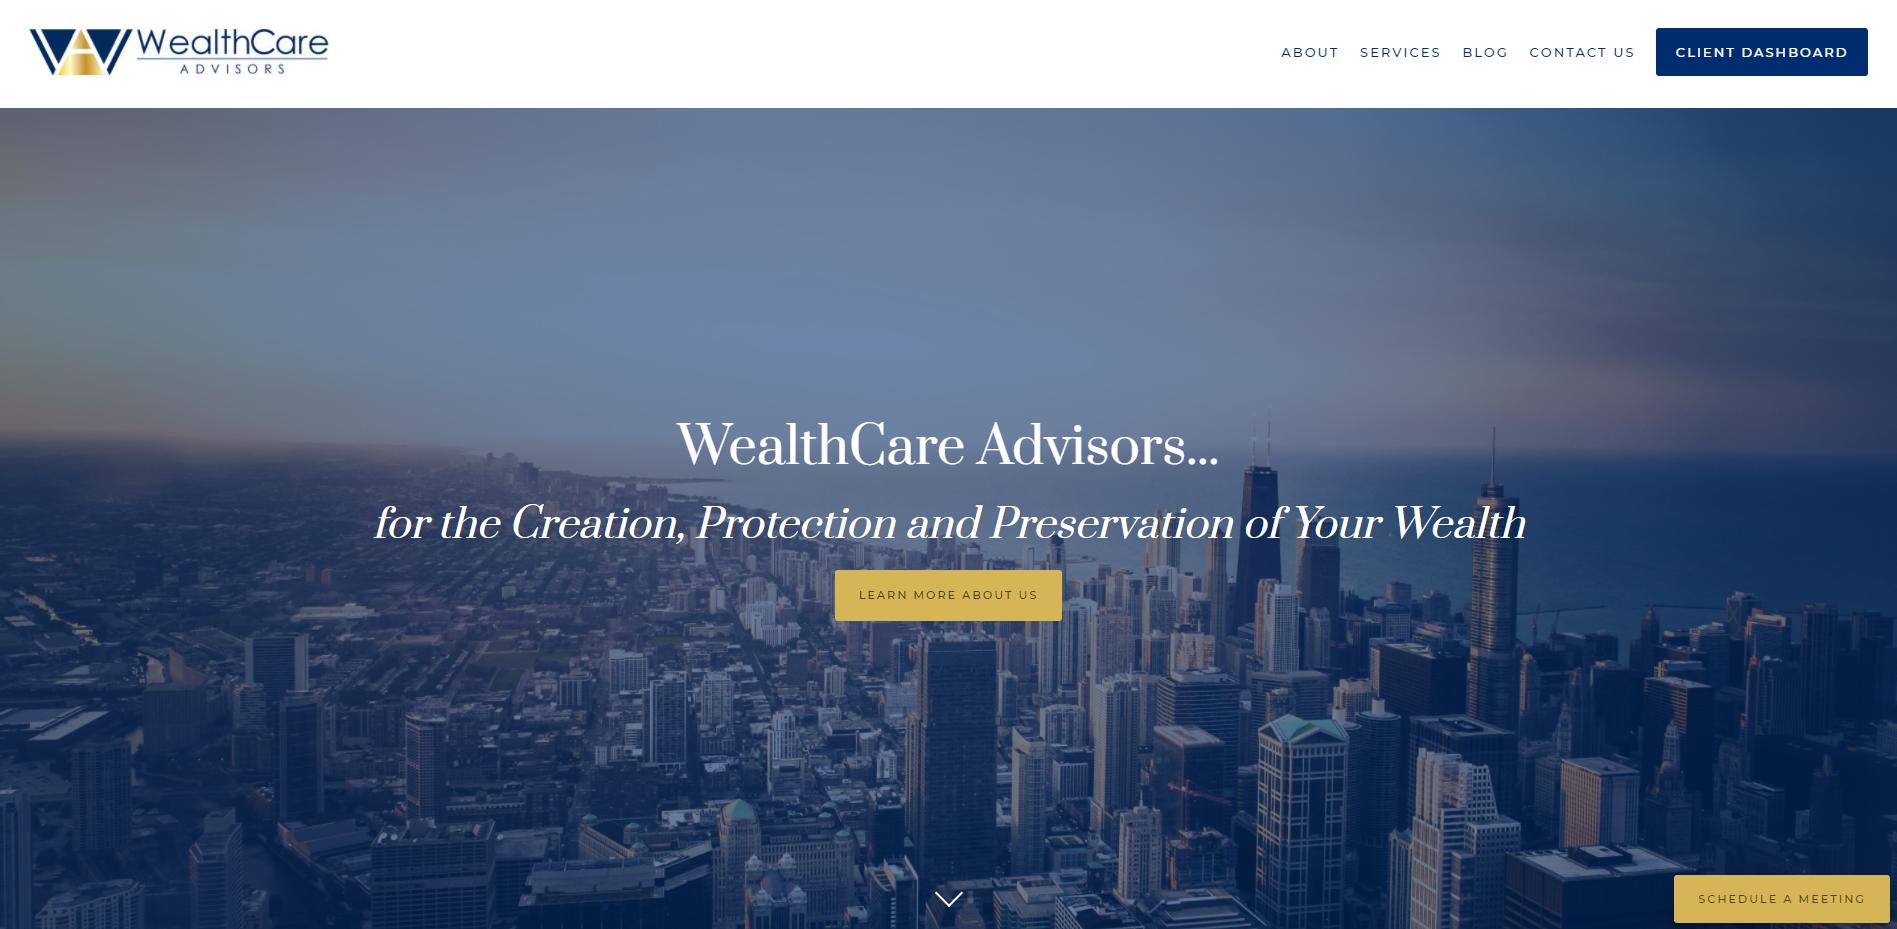 WealthCare Advisors Homepage